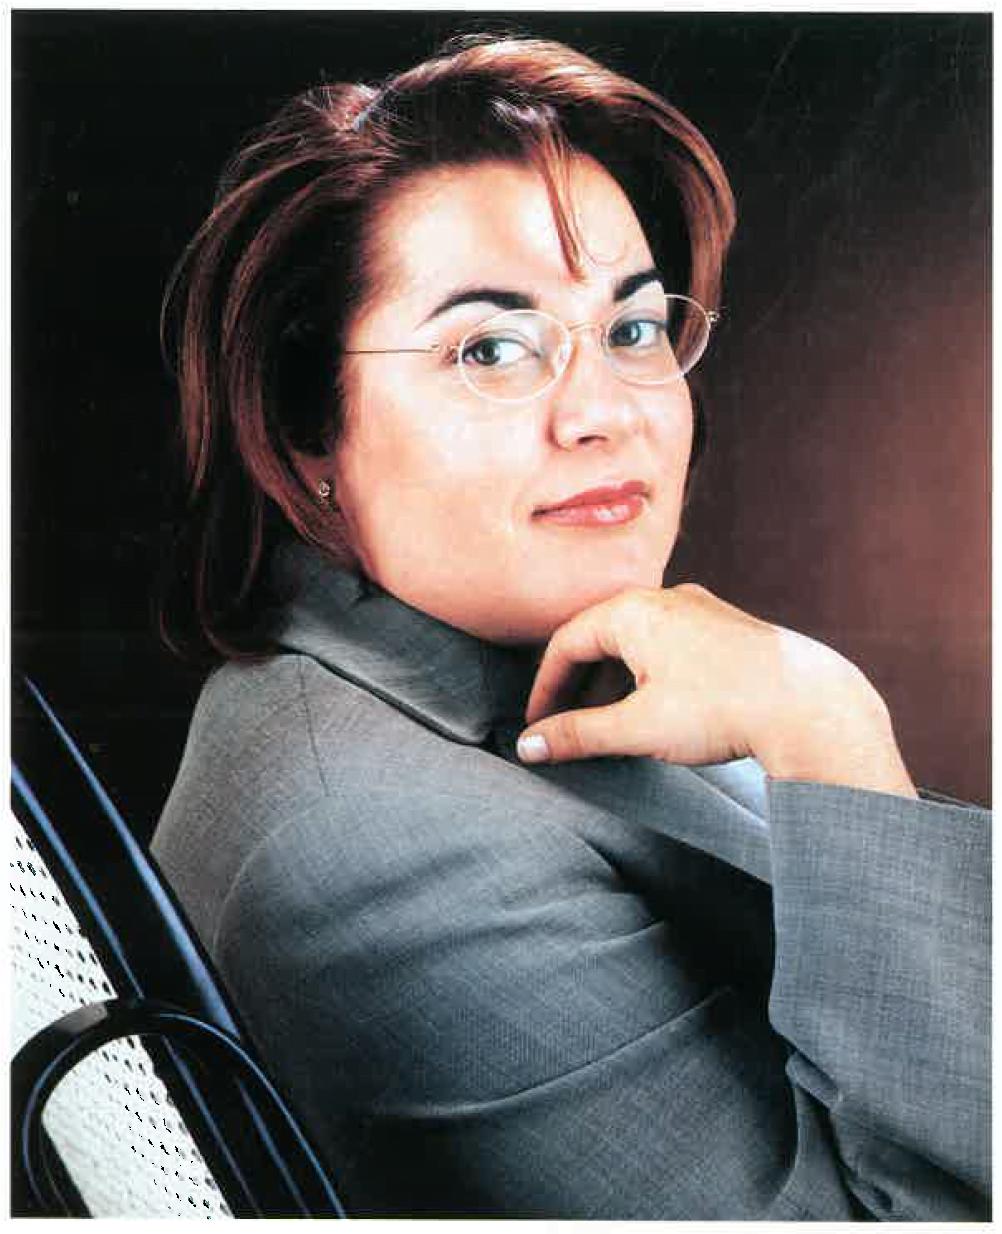 Marta Valldosera